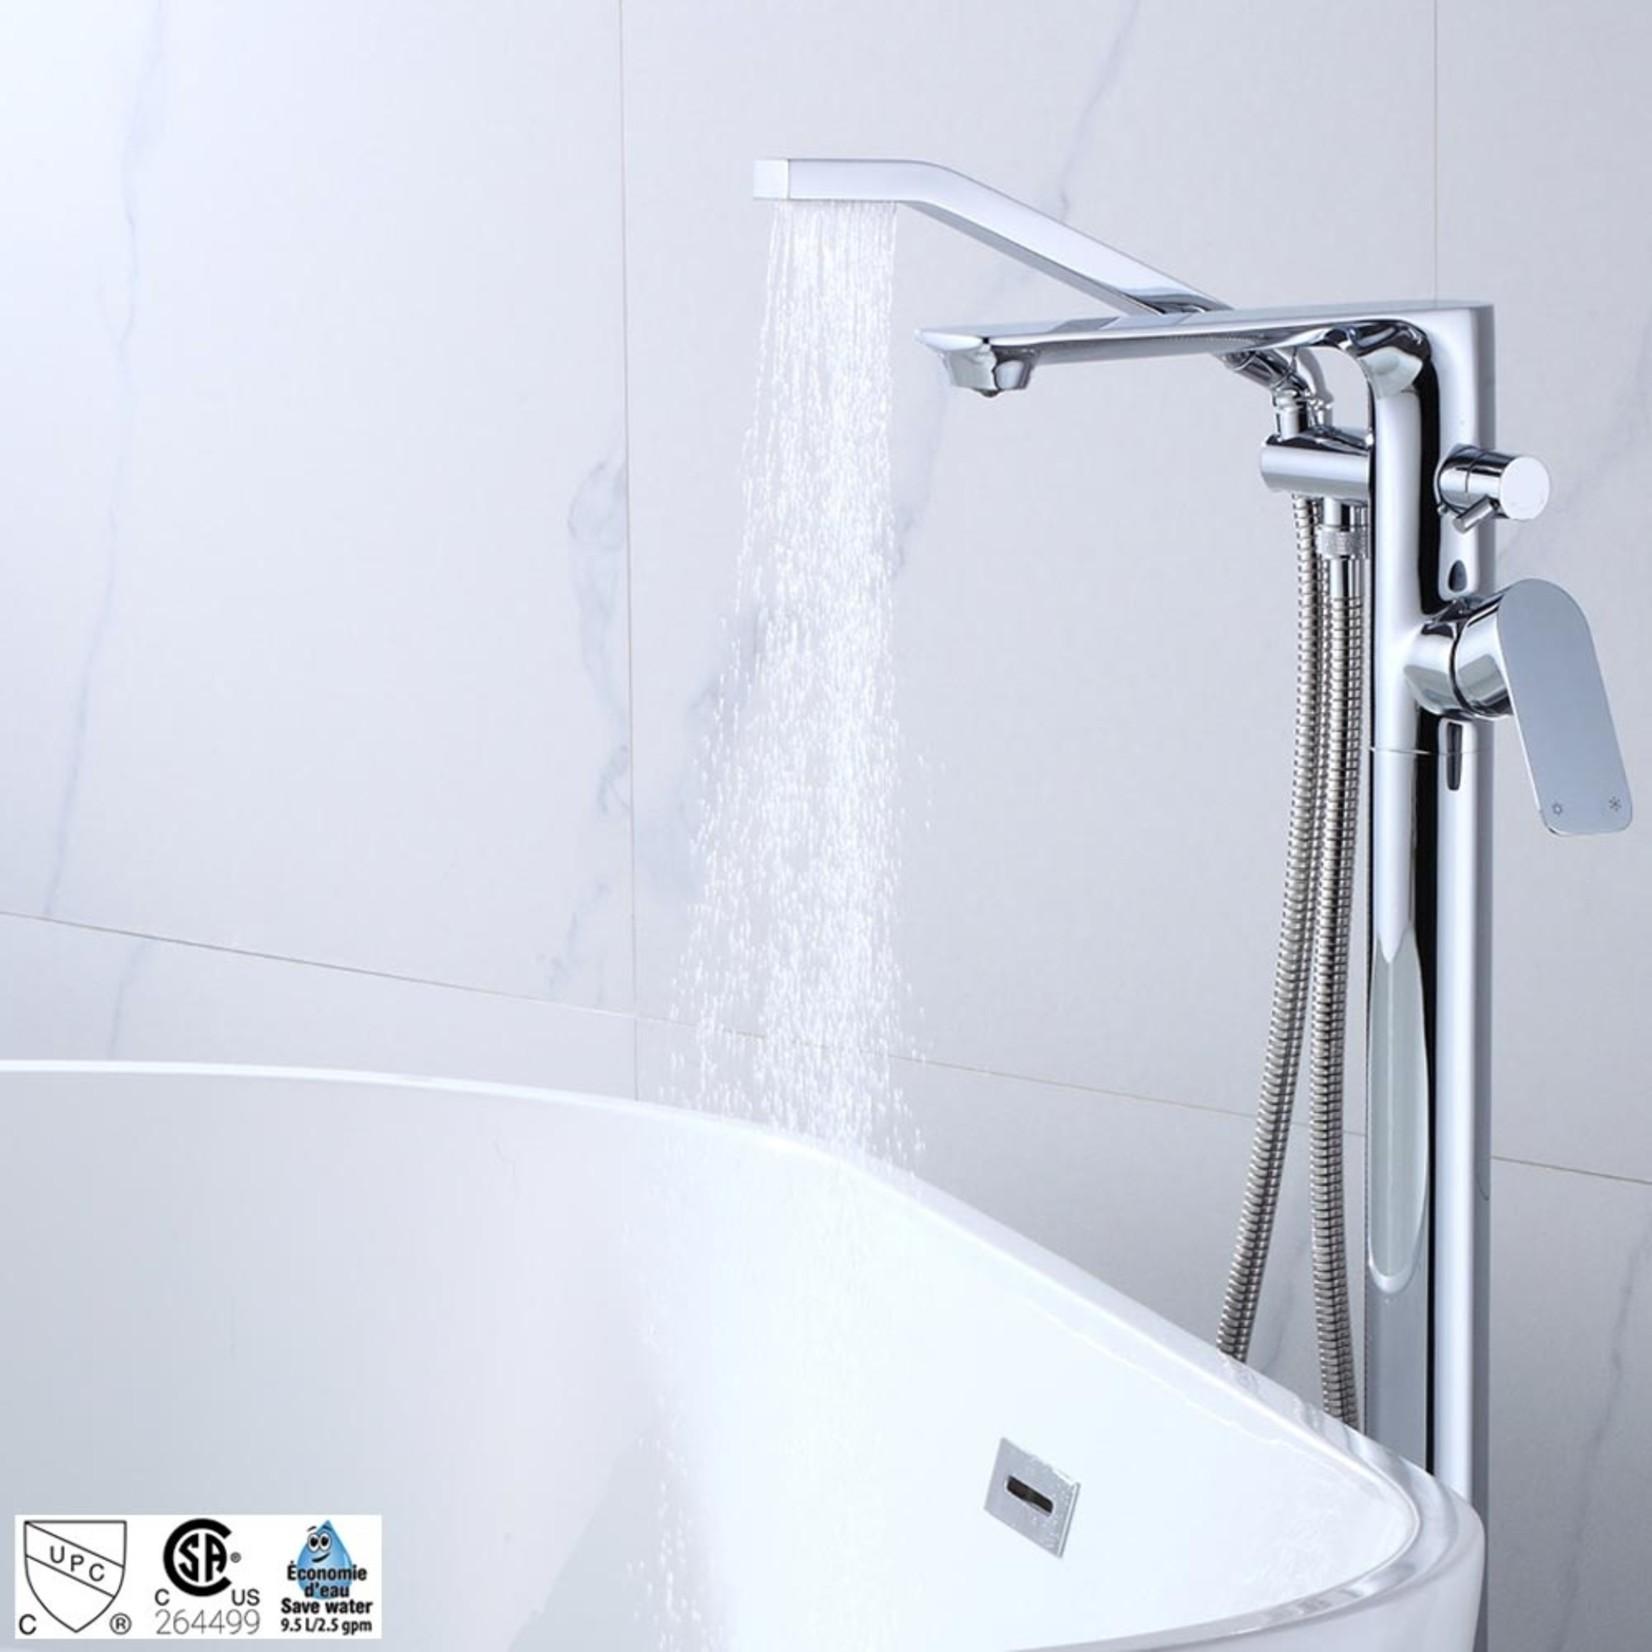 Robinet de bain sur pied chrome collection Elena ak+ 6126CP